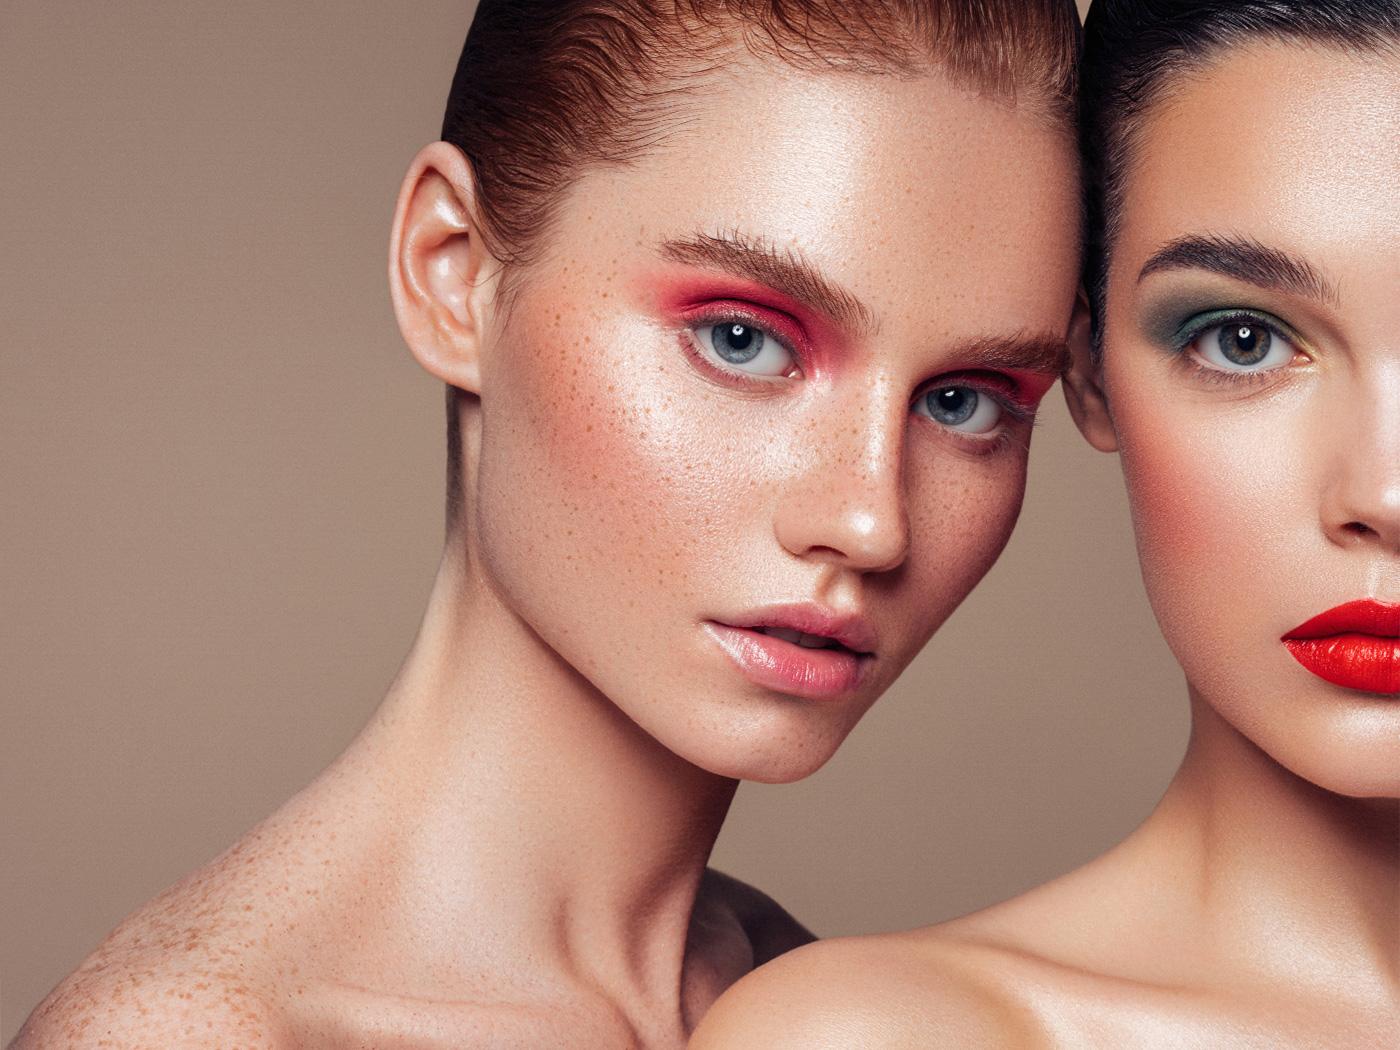 5 makeup hacks για να κάνεις το μακιγιάζ σου πιο γρήγορα